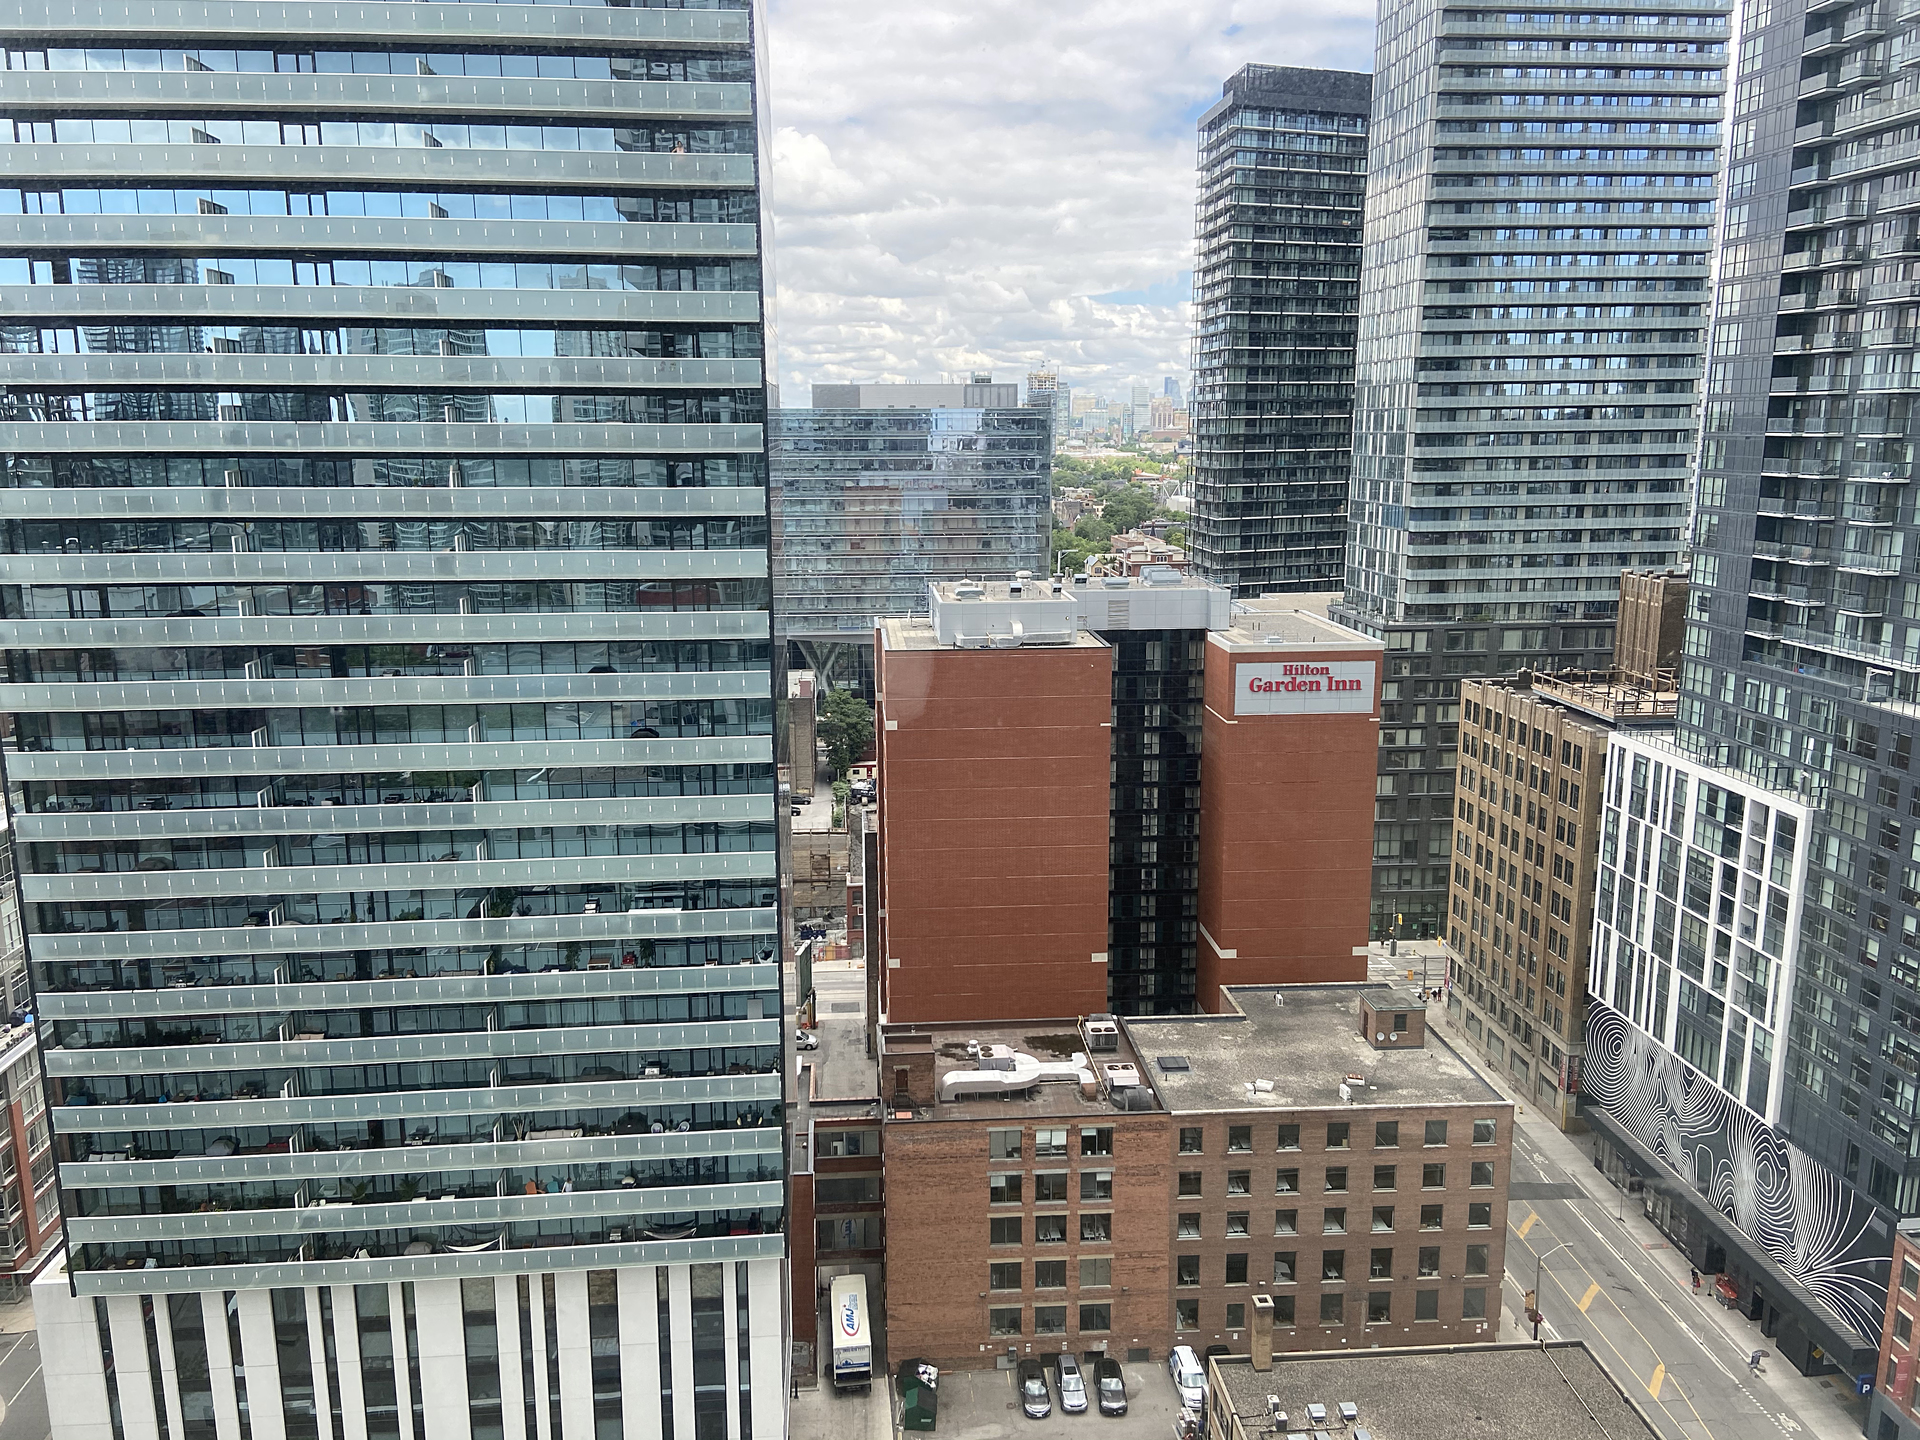 View at 2207 - 375 King Street W, Waterfront Communities C1, Toronto